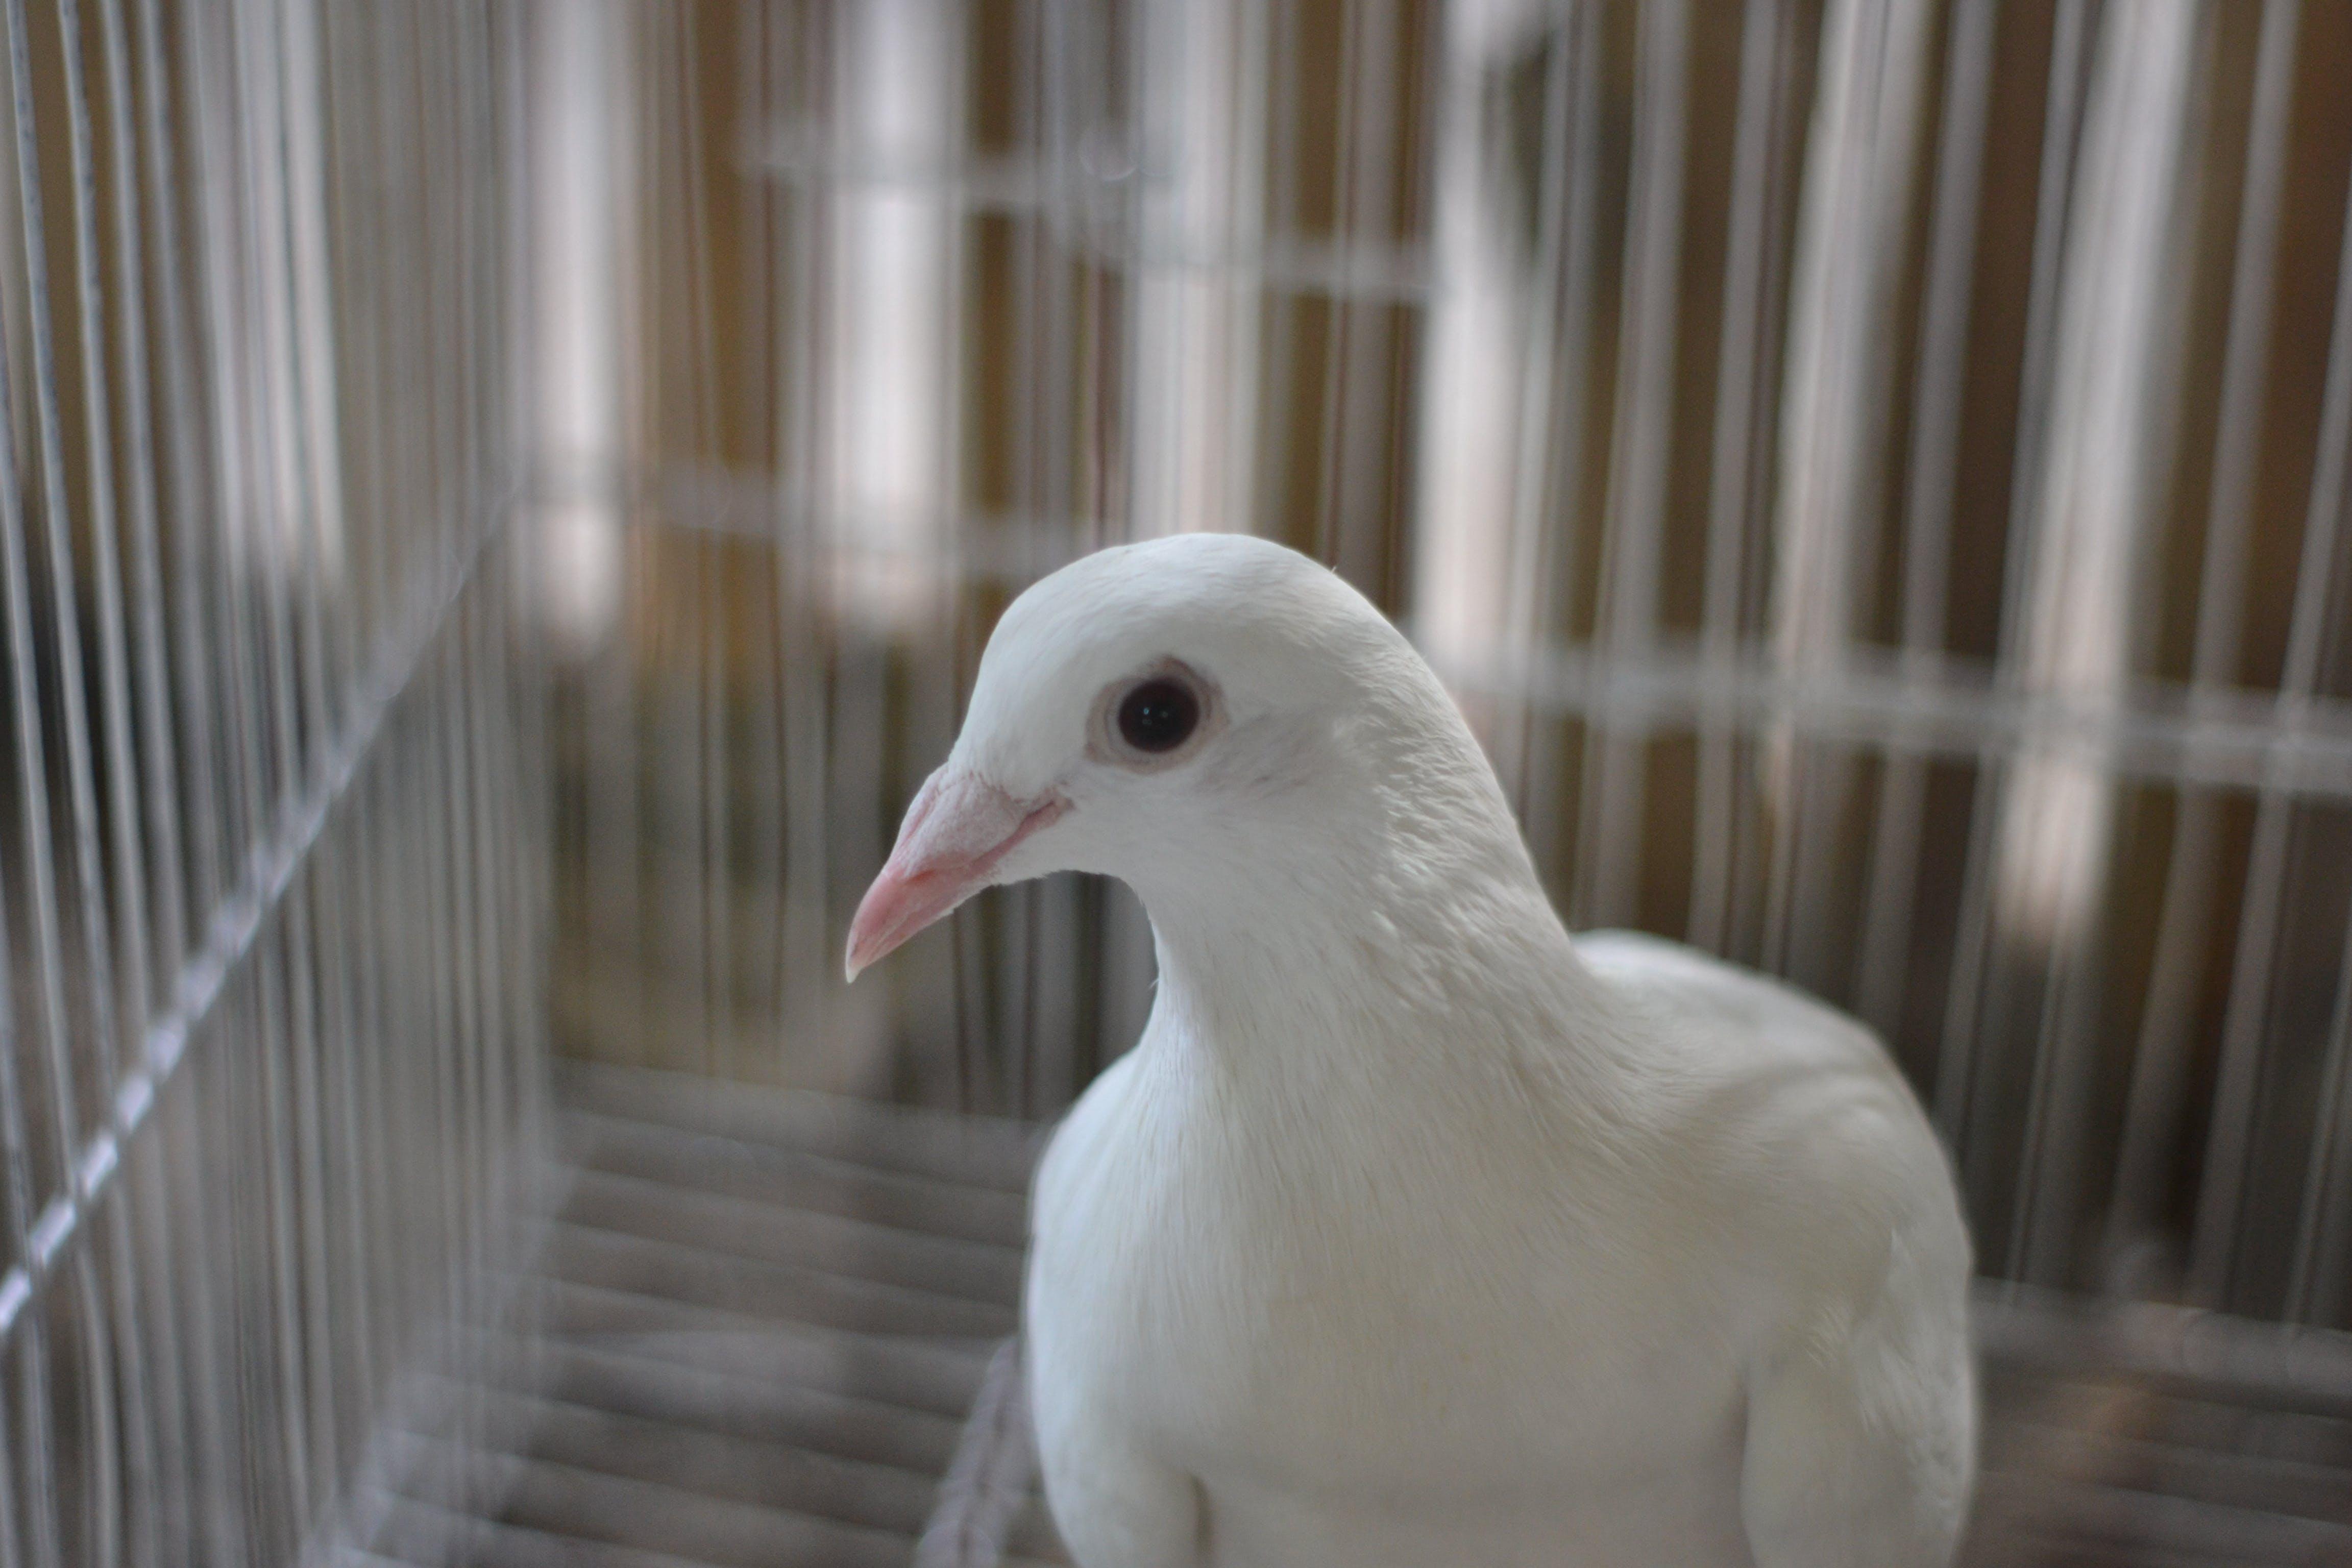 Portrait of White Pigeon